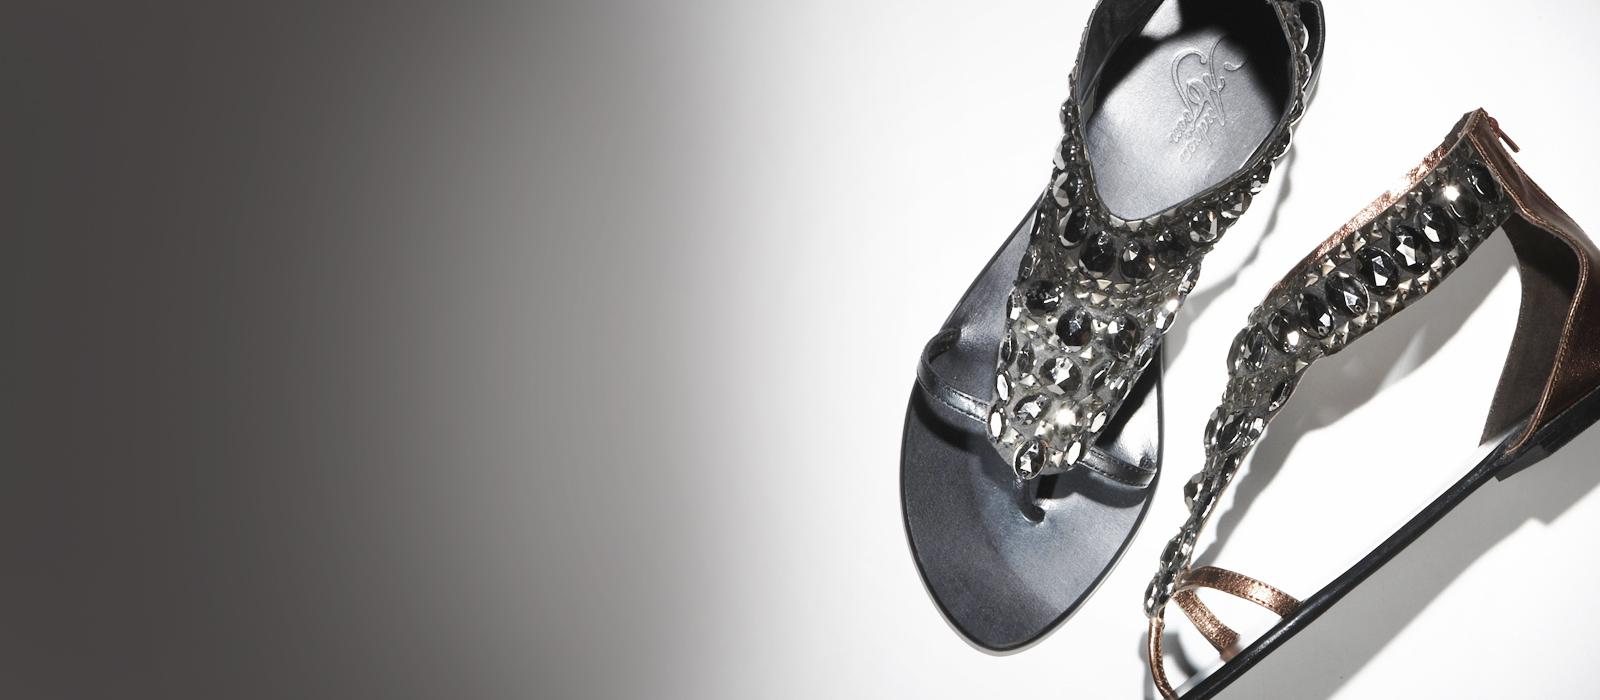 JohnFashion Sandals